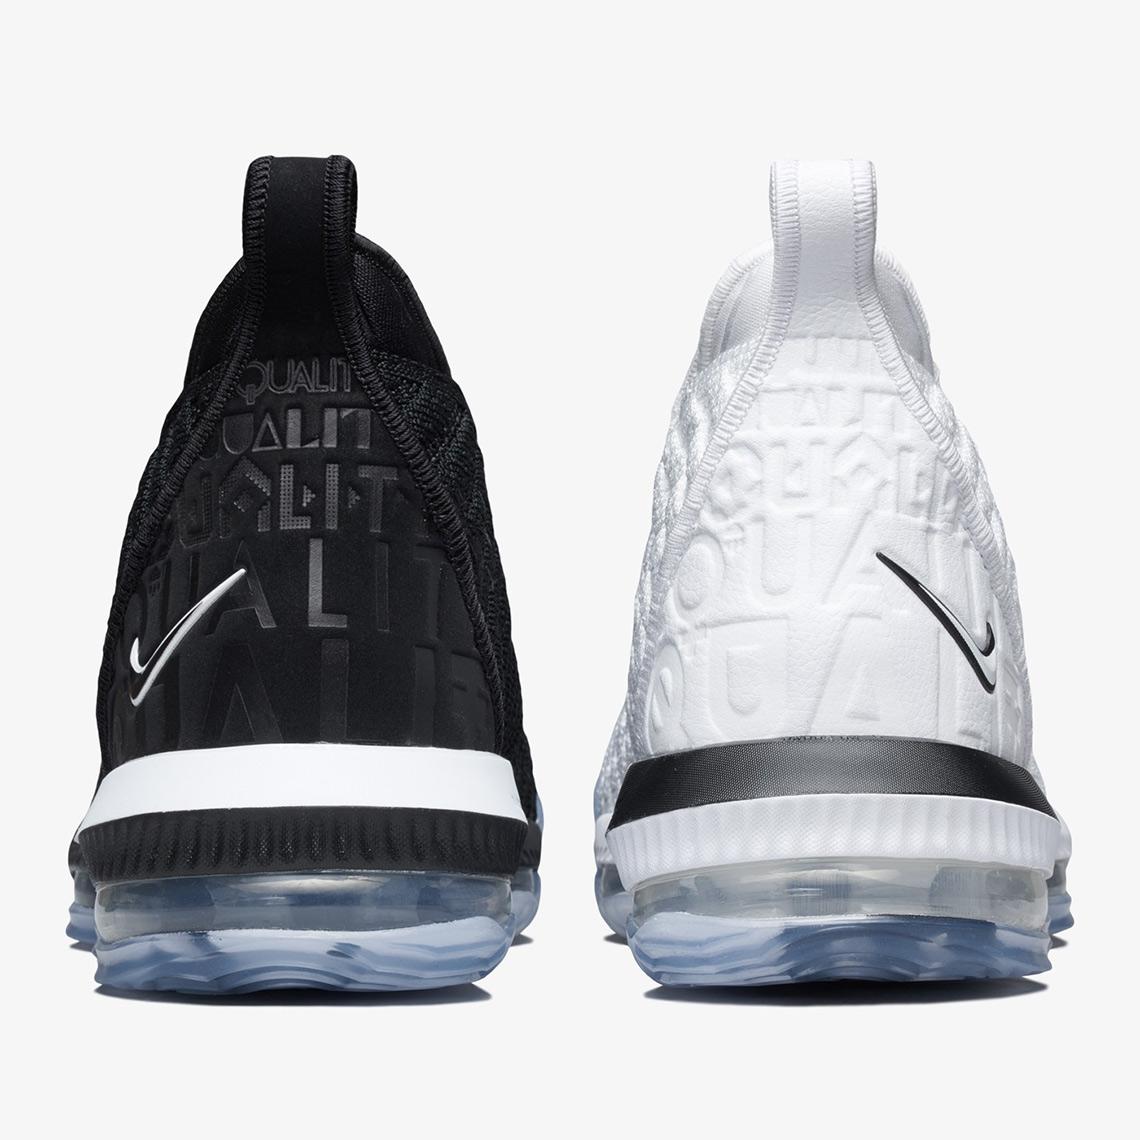 121275806da1 Nike LeBron 16 Equality Release Info